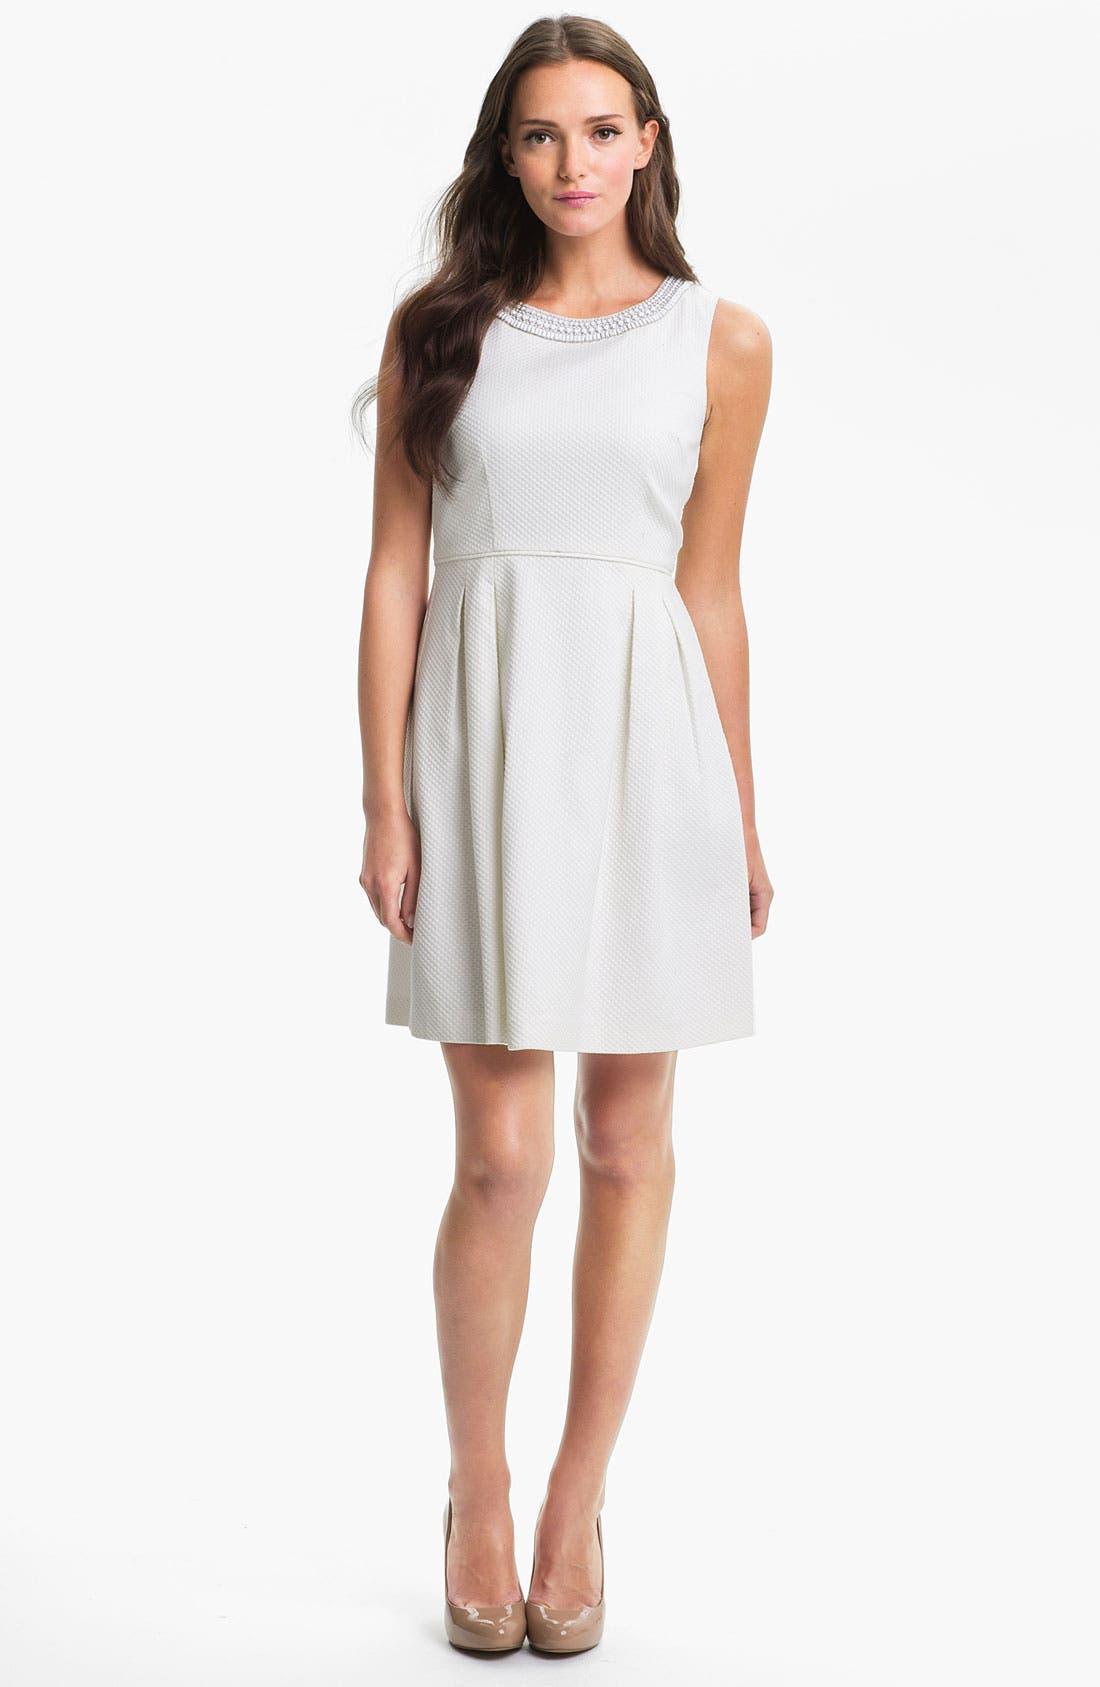 Main Image - Trina Turk 'Seles' Embellished Fit & Flare Dress